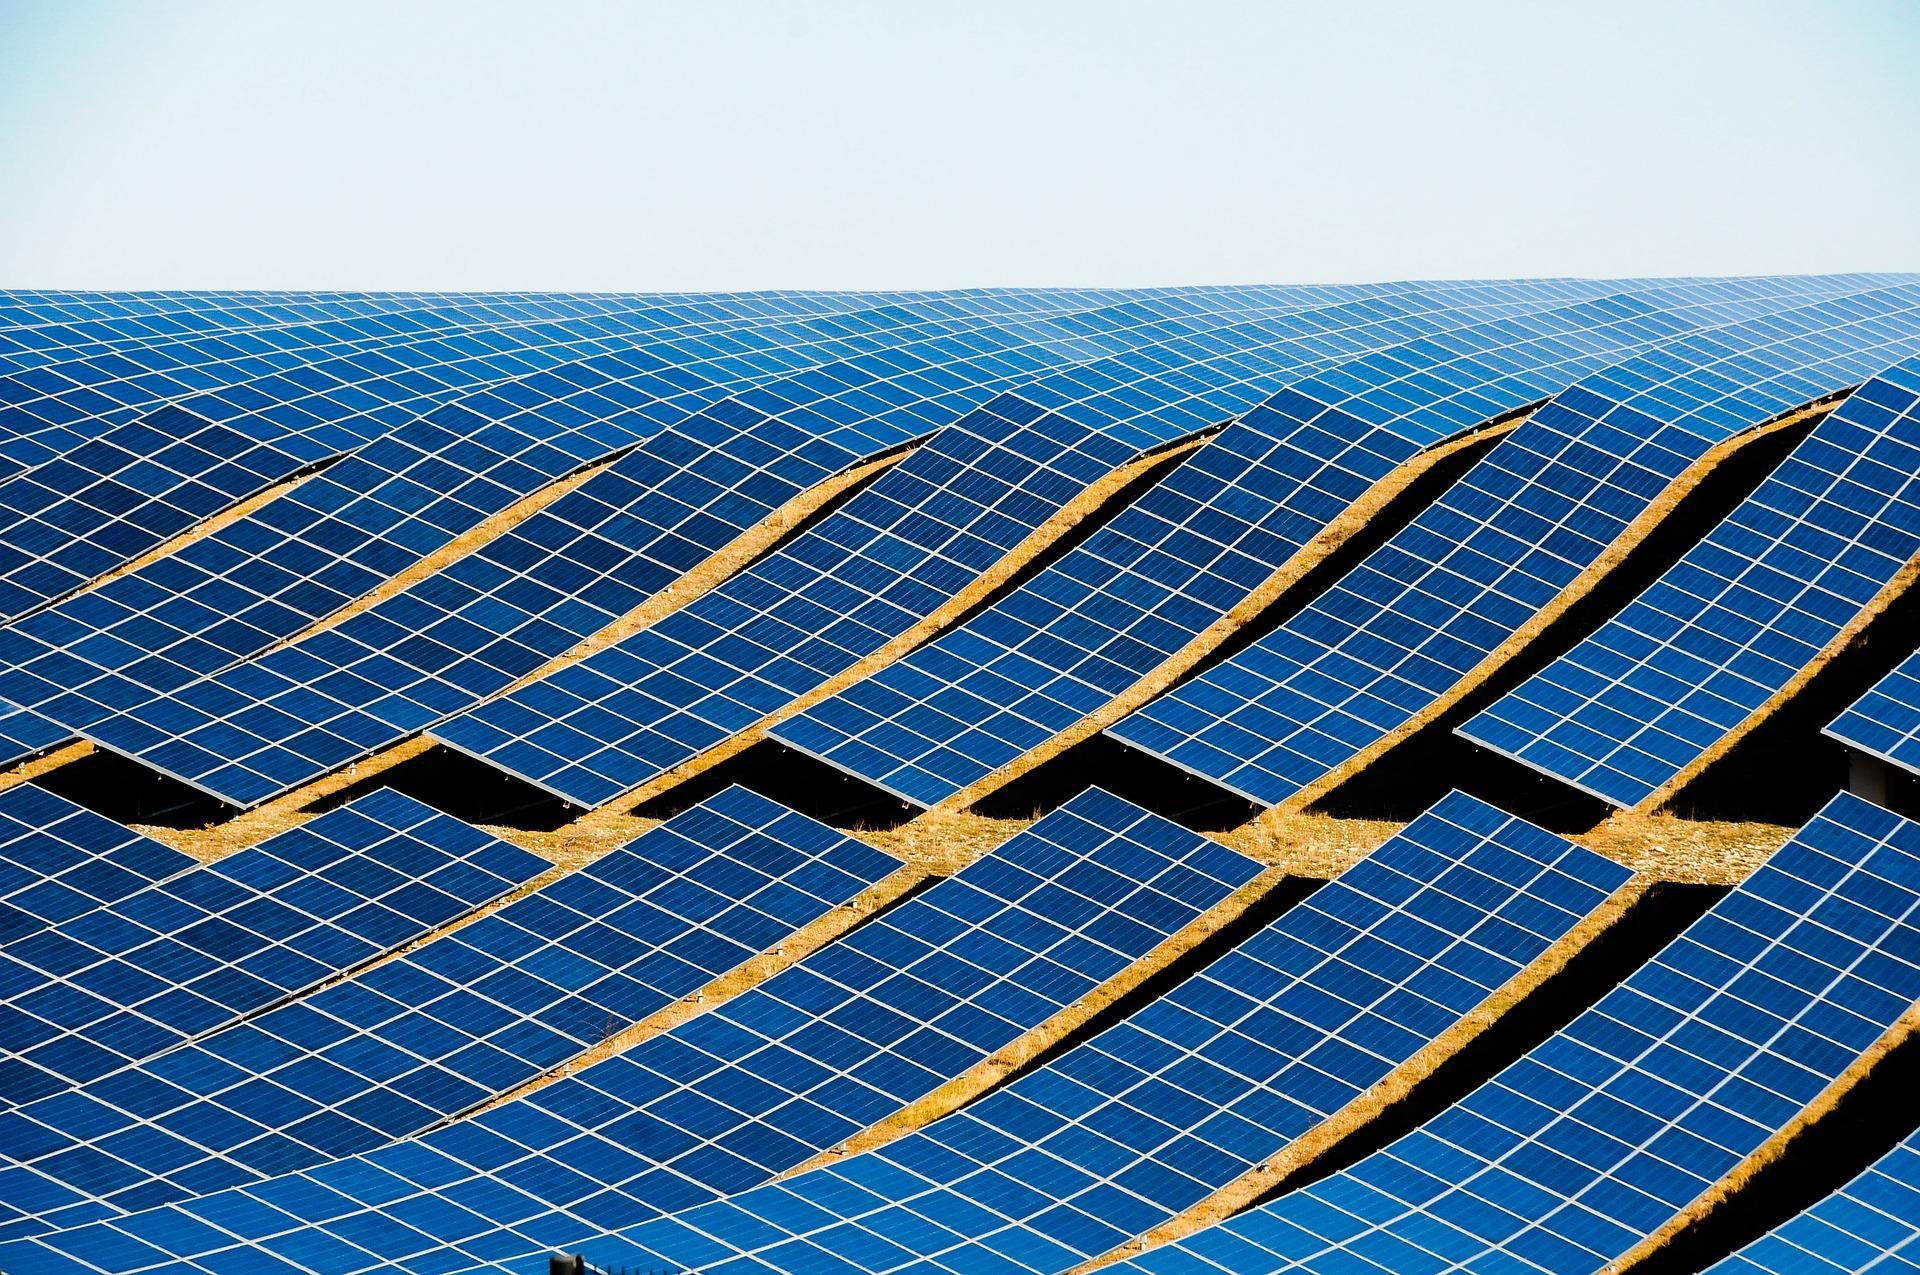 Erneuerbare Energien – die EEG-Umlage vor demEuGH